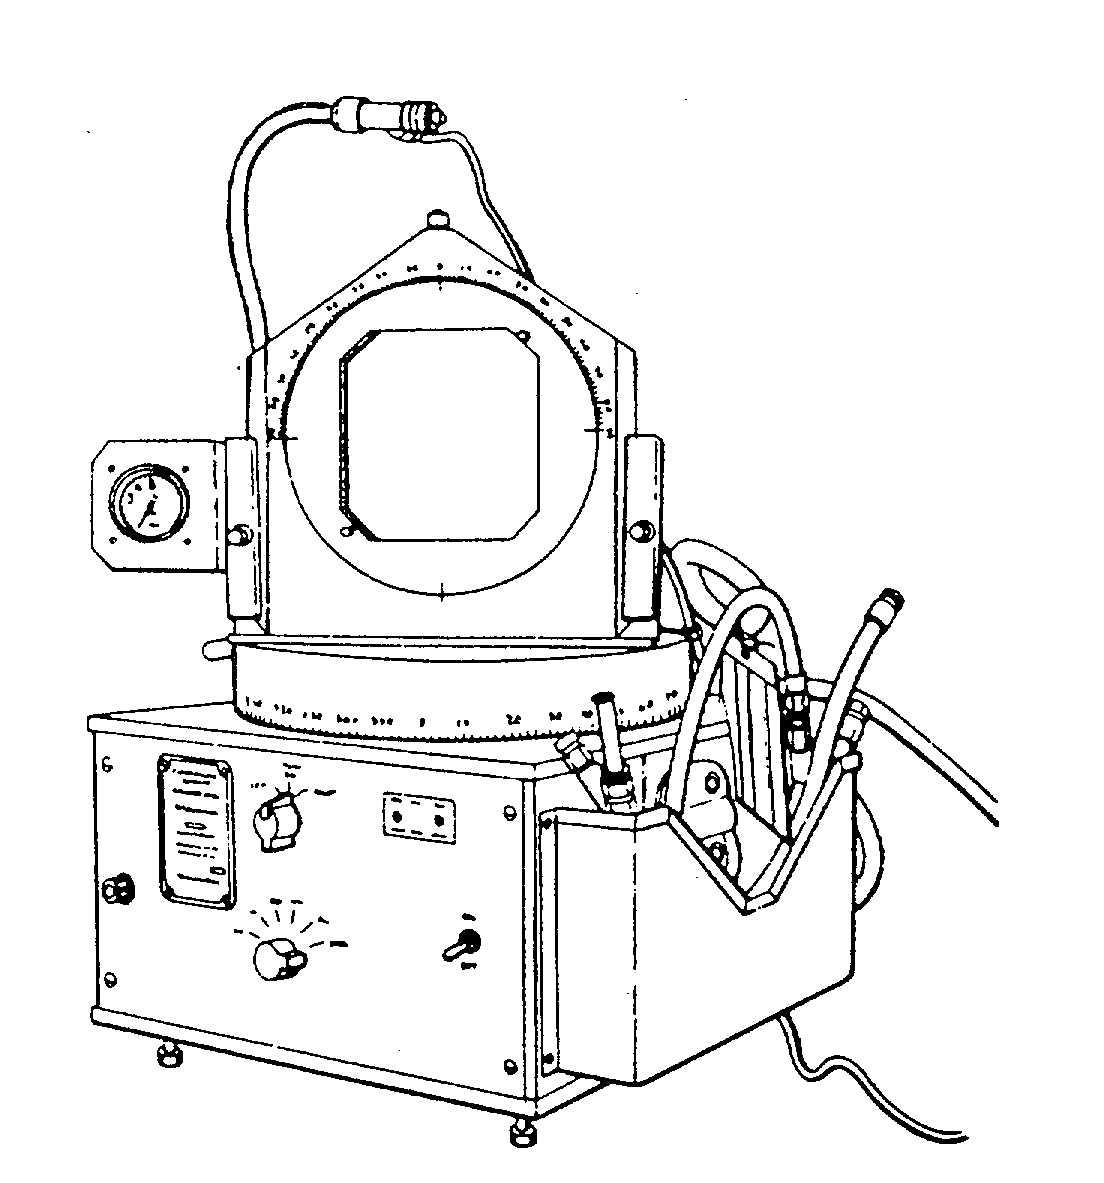 Figure 4-4. Turntable Instrument Tester